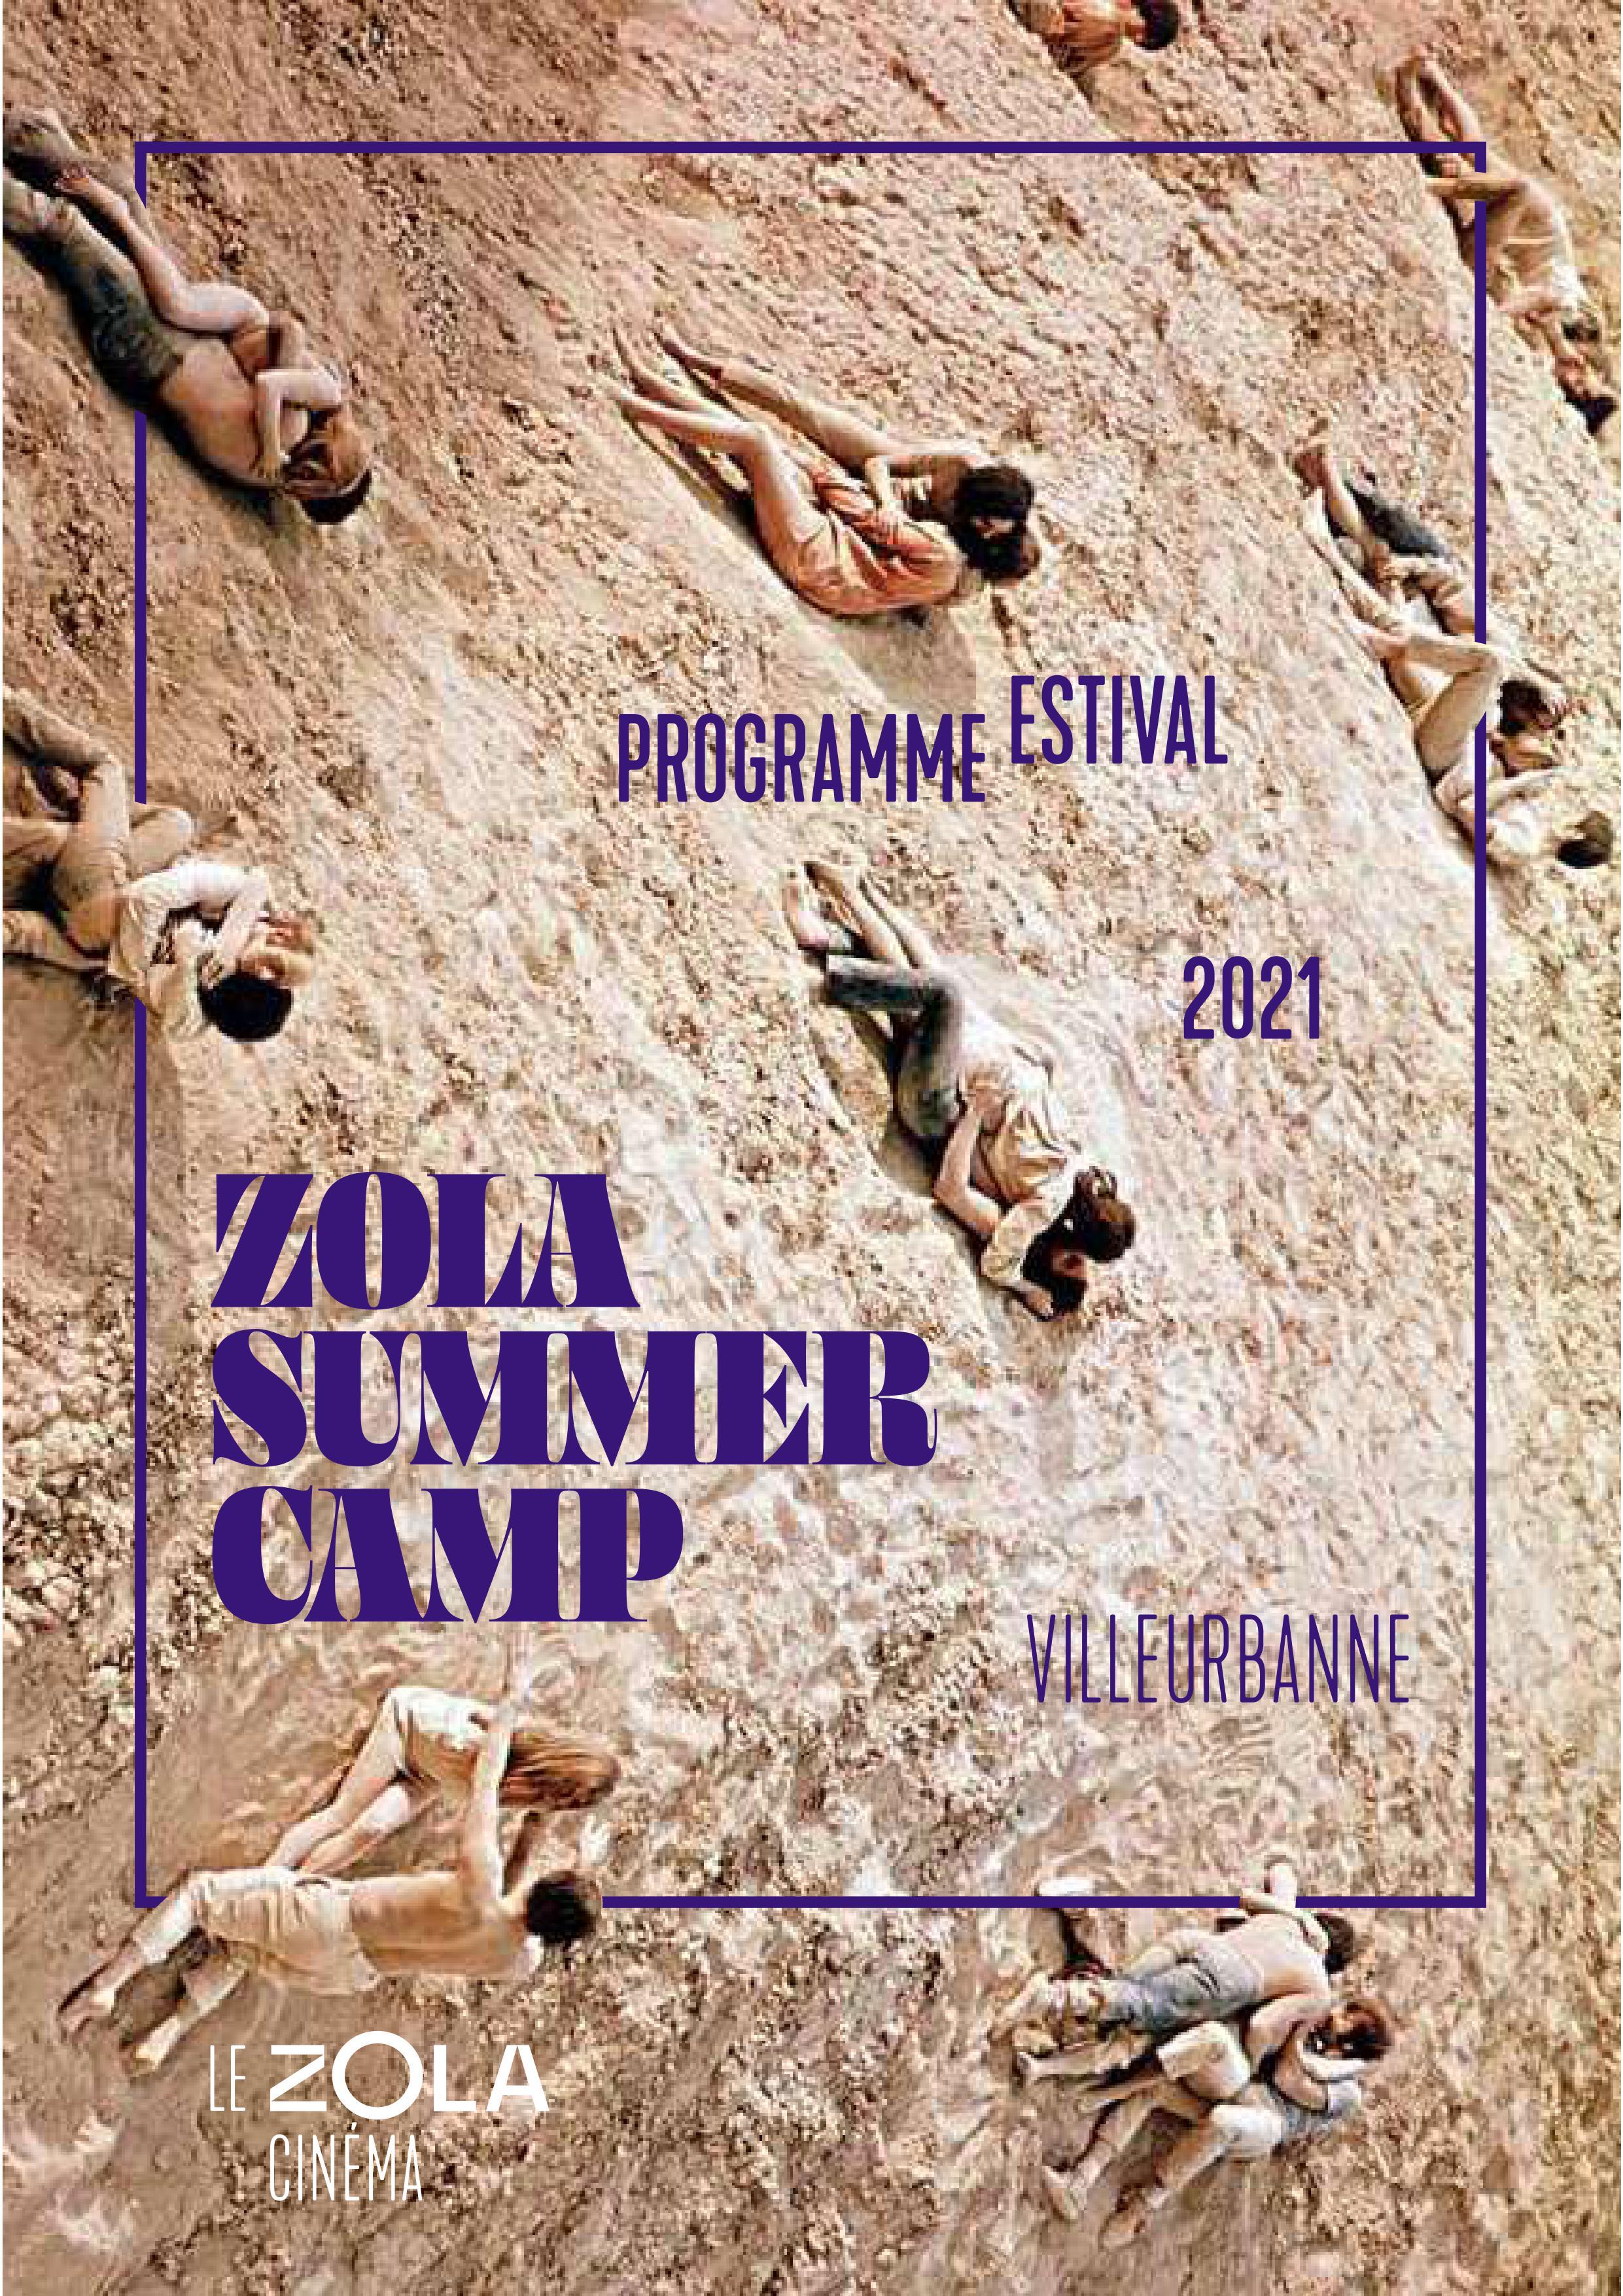 ZOLA SUMMER CAMP